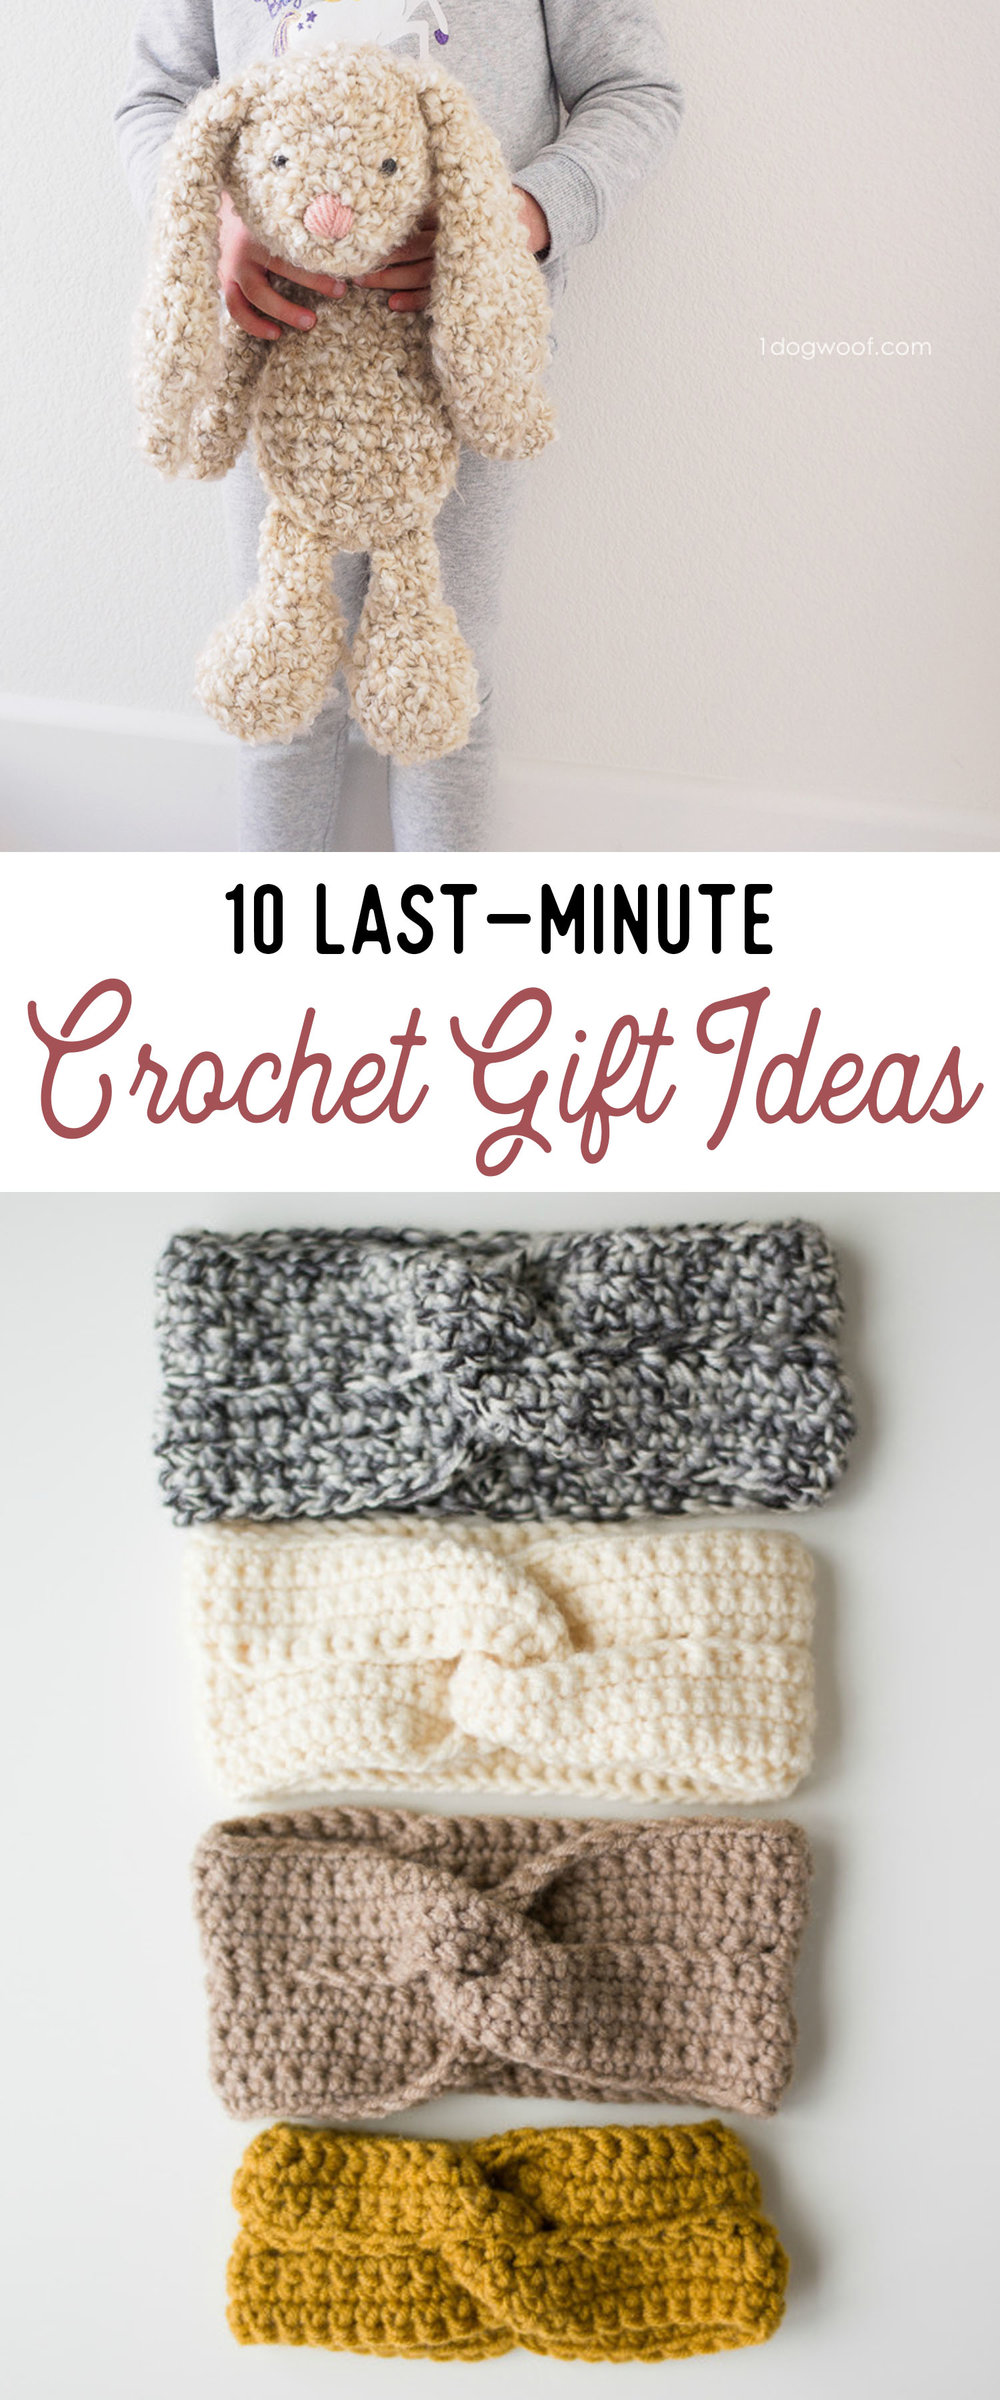 giftcrochetpin.jpg & Ten Last-Minute Crochet Gift Ideas (All Free Patterns!) u2014 Megmade ...